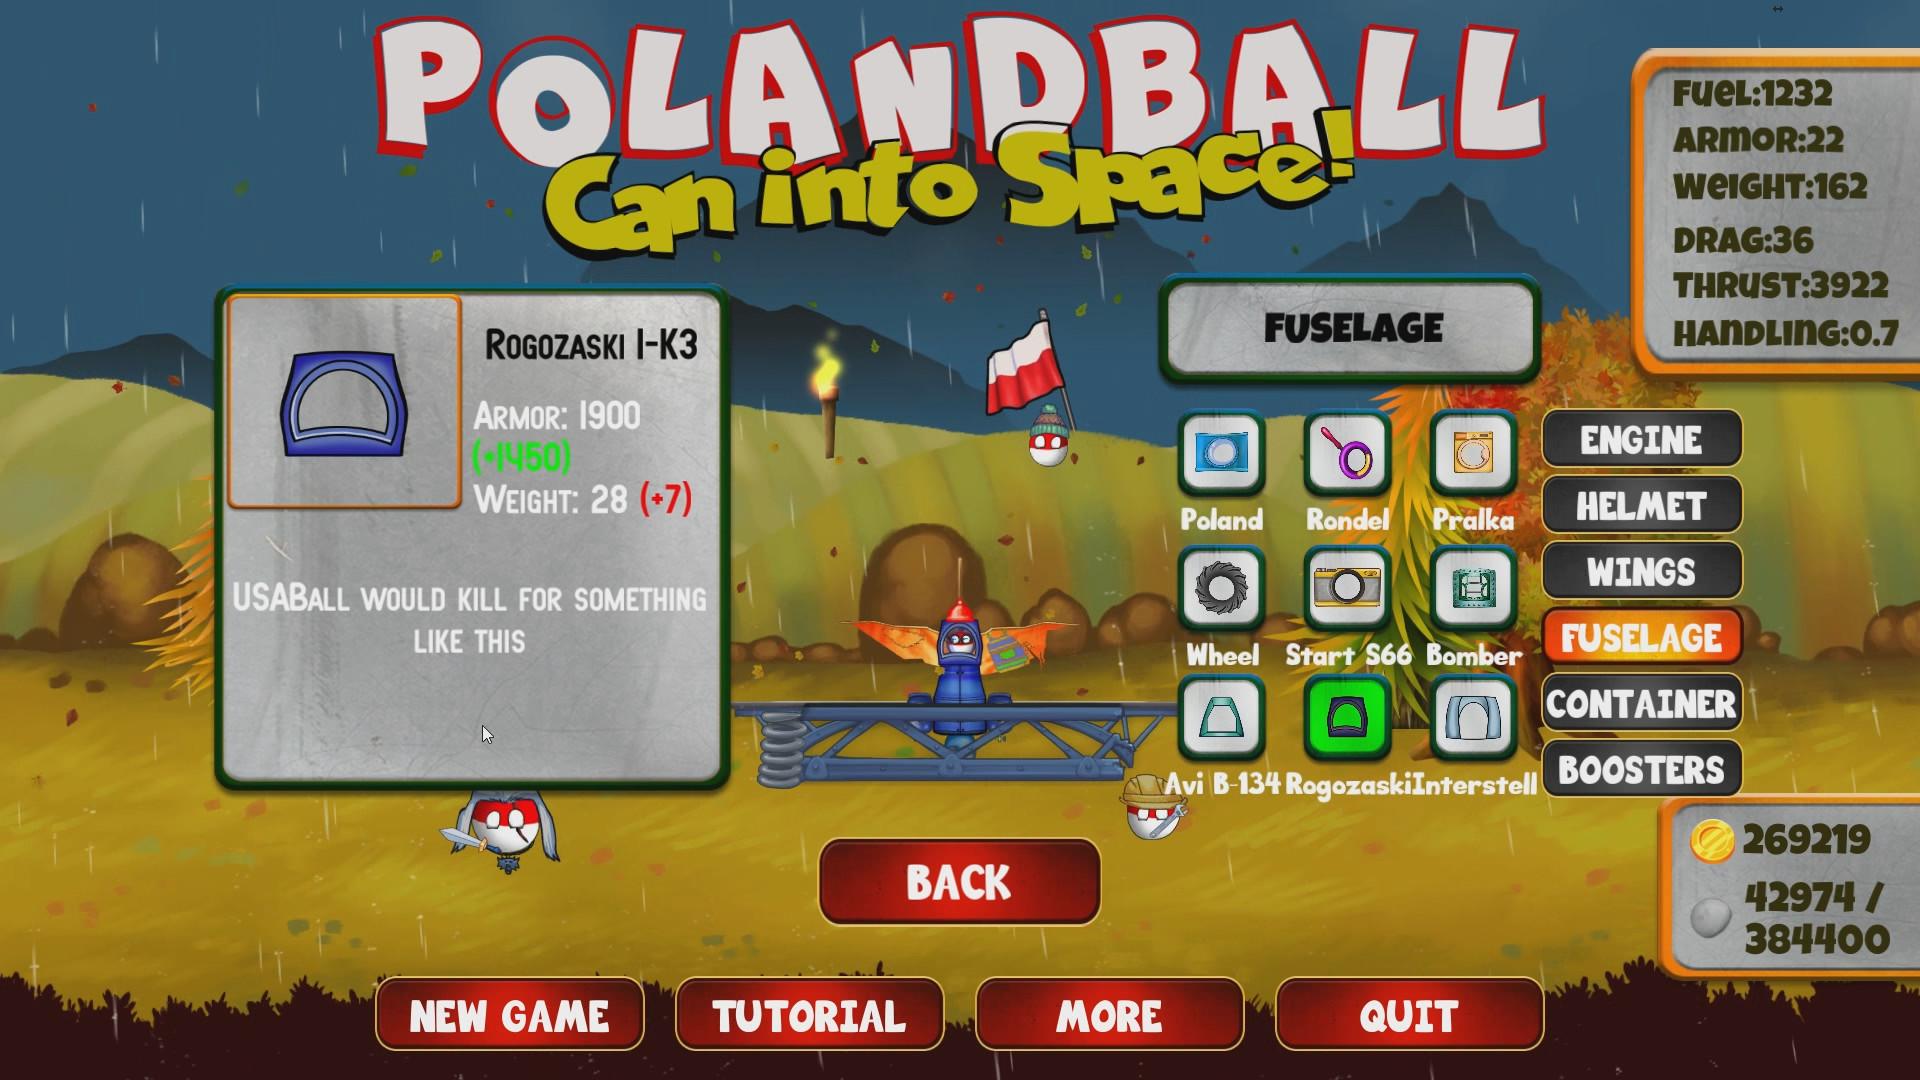 Steam Community :: Polandball: Can into Space! :: Game Art